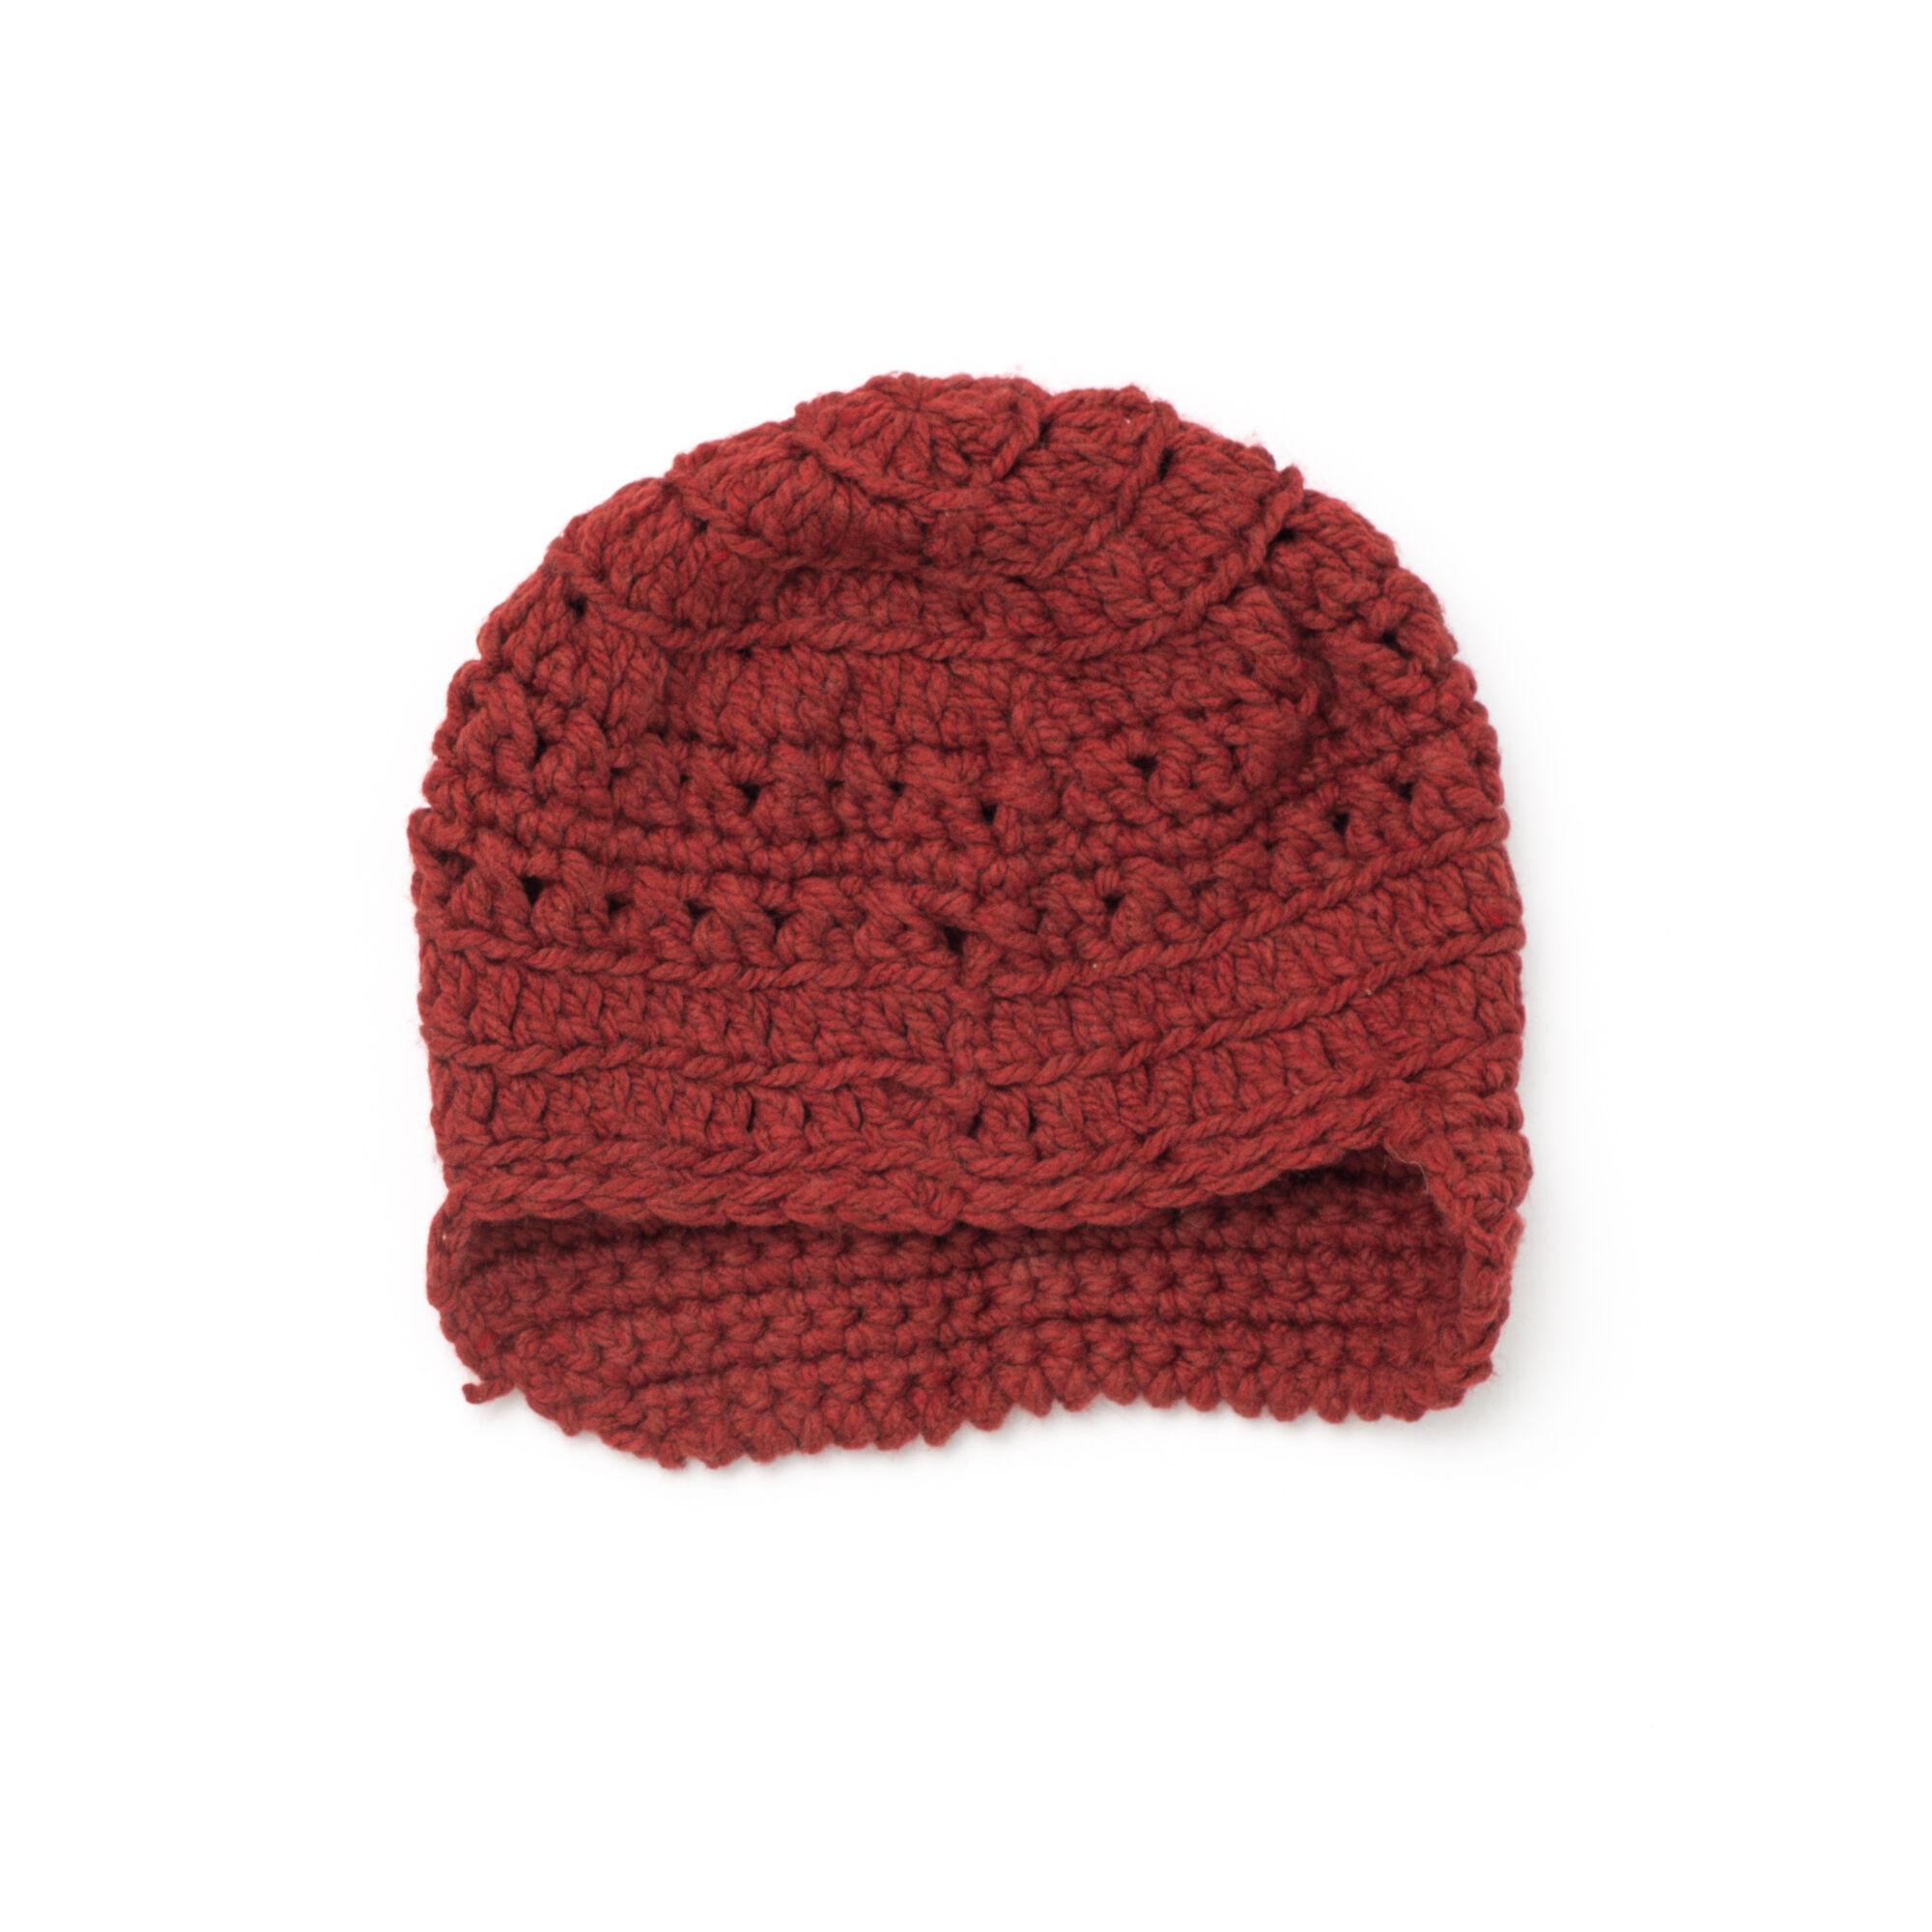 Bernat Slouchy Peaked Hat | Yarnspirations